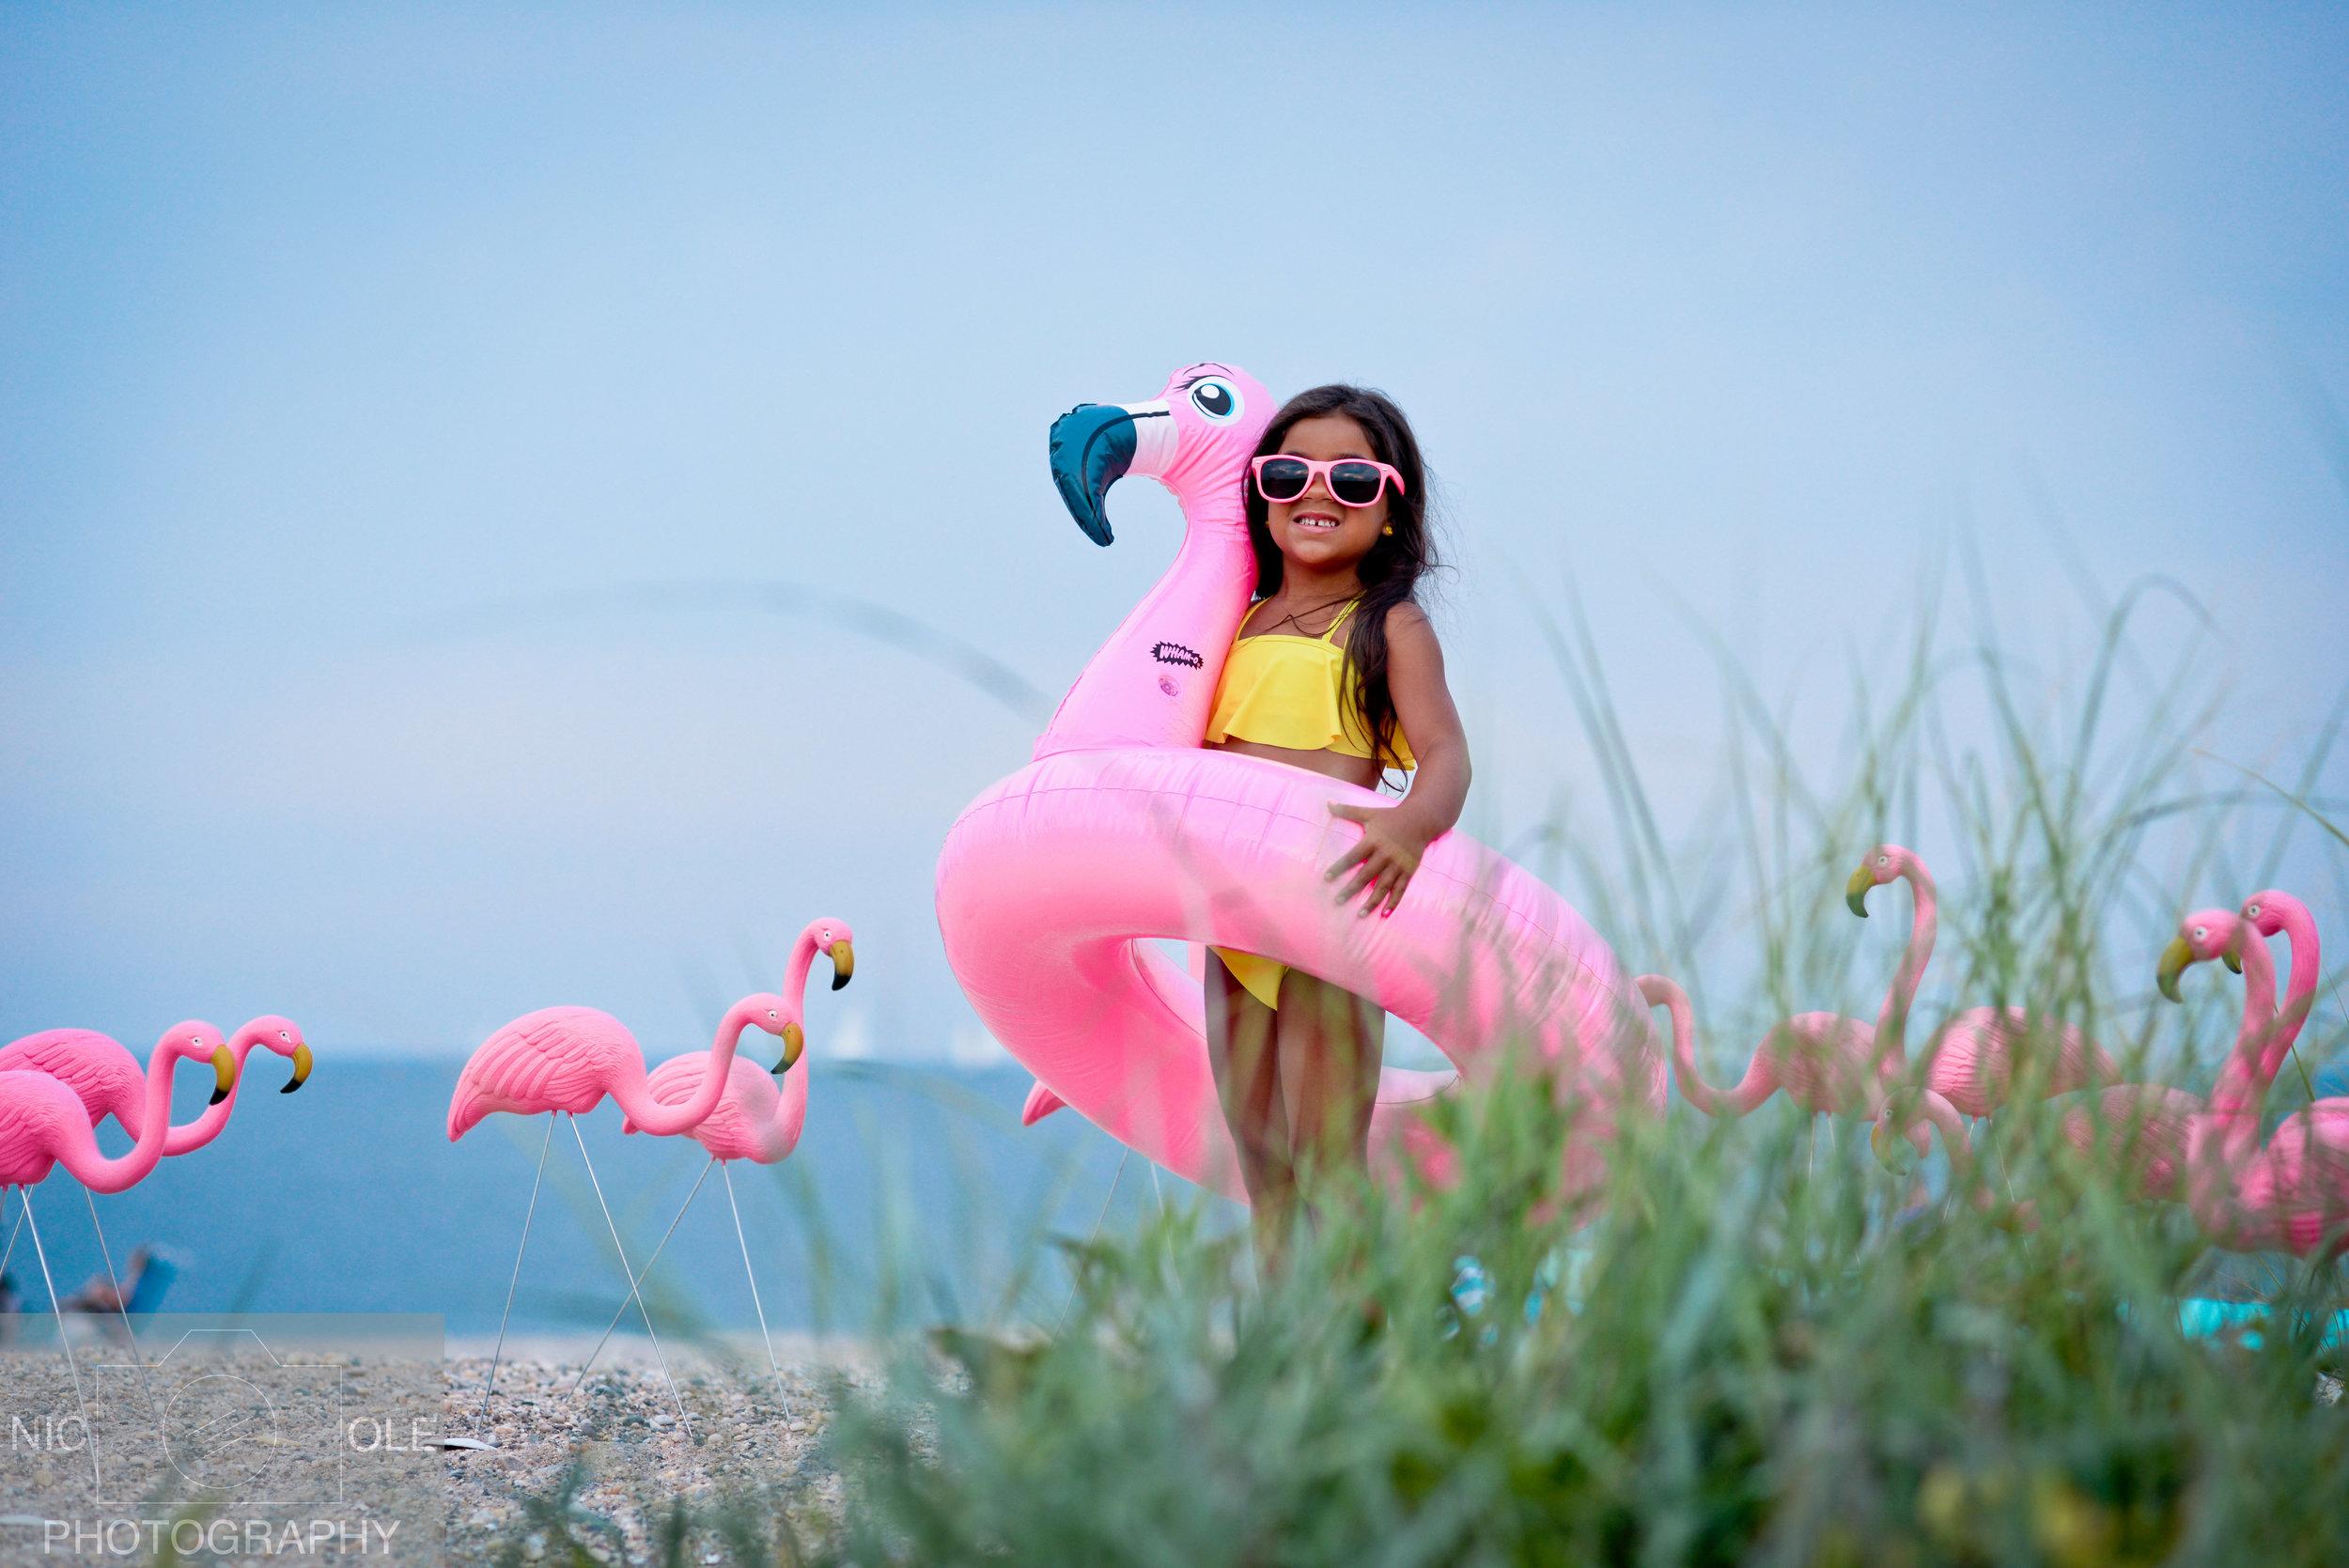 Cielo Noemi Flamingo Beach 7.20.17- NIC-OLE Photography-6.jpg